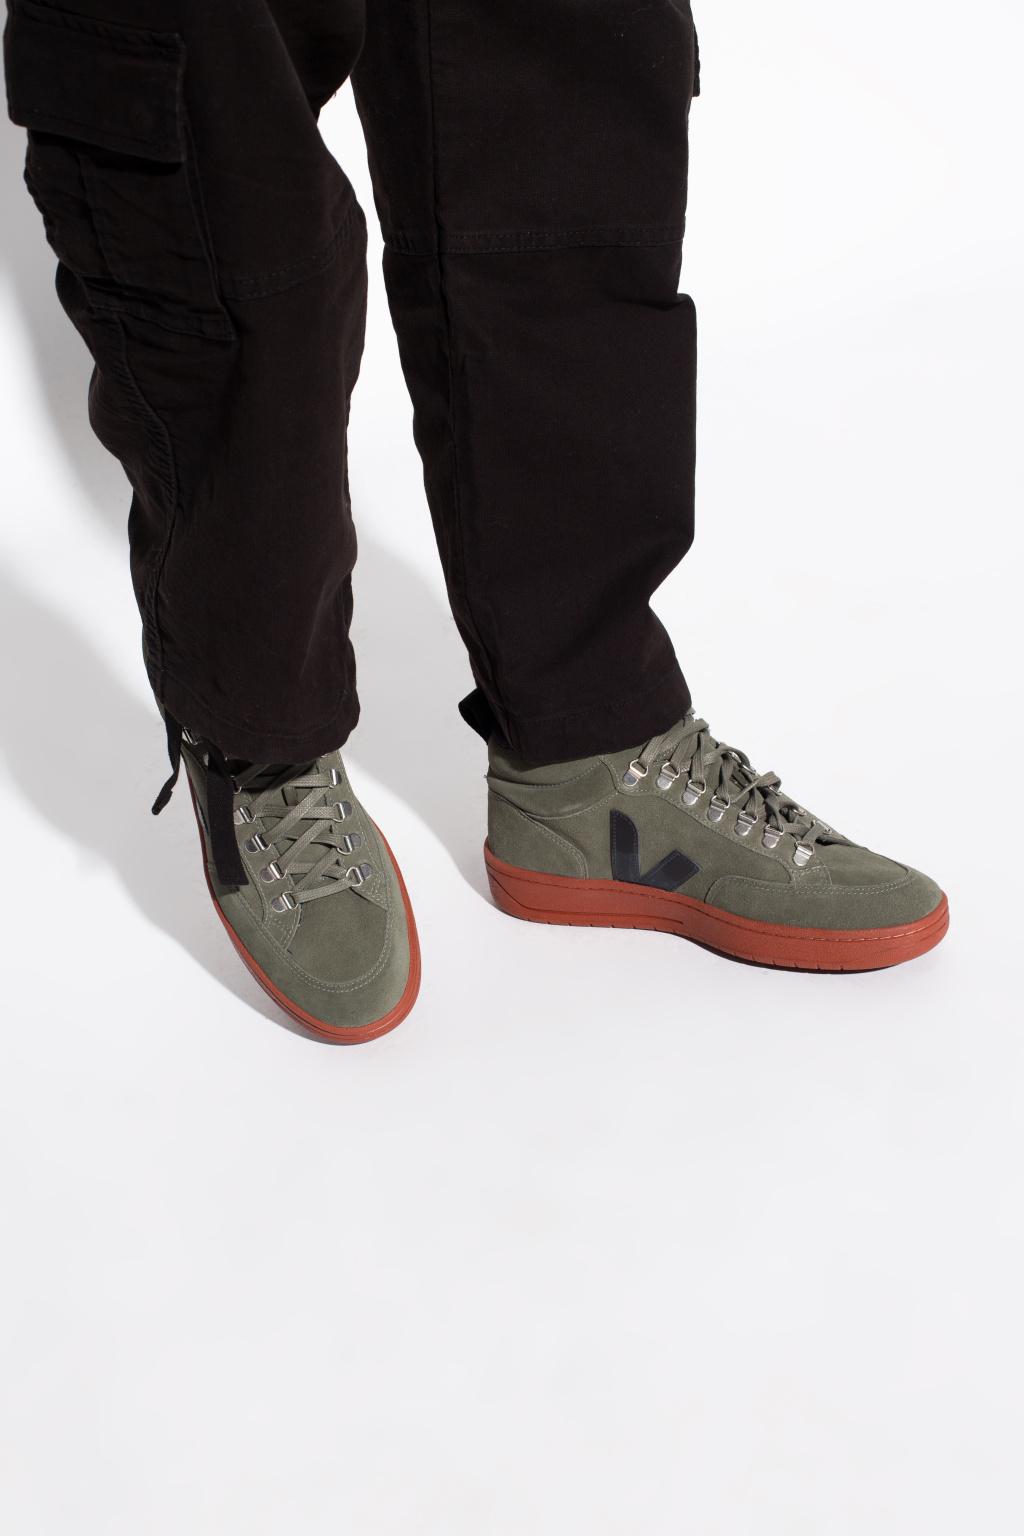 Veja 'Roraima' high-top sneakers